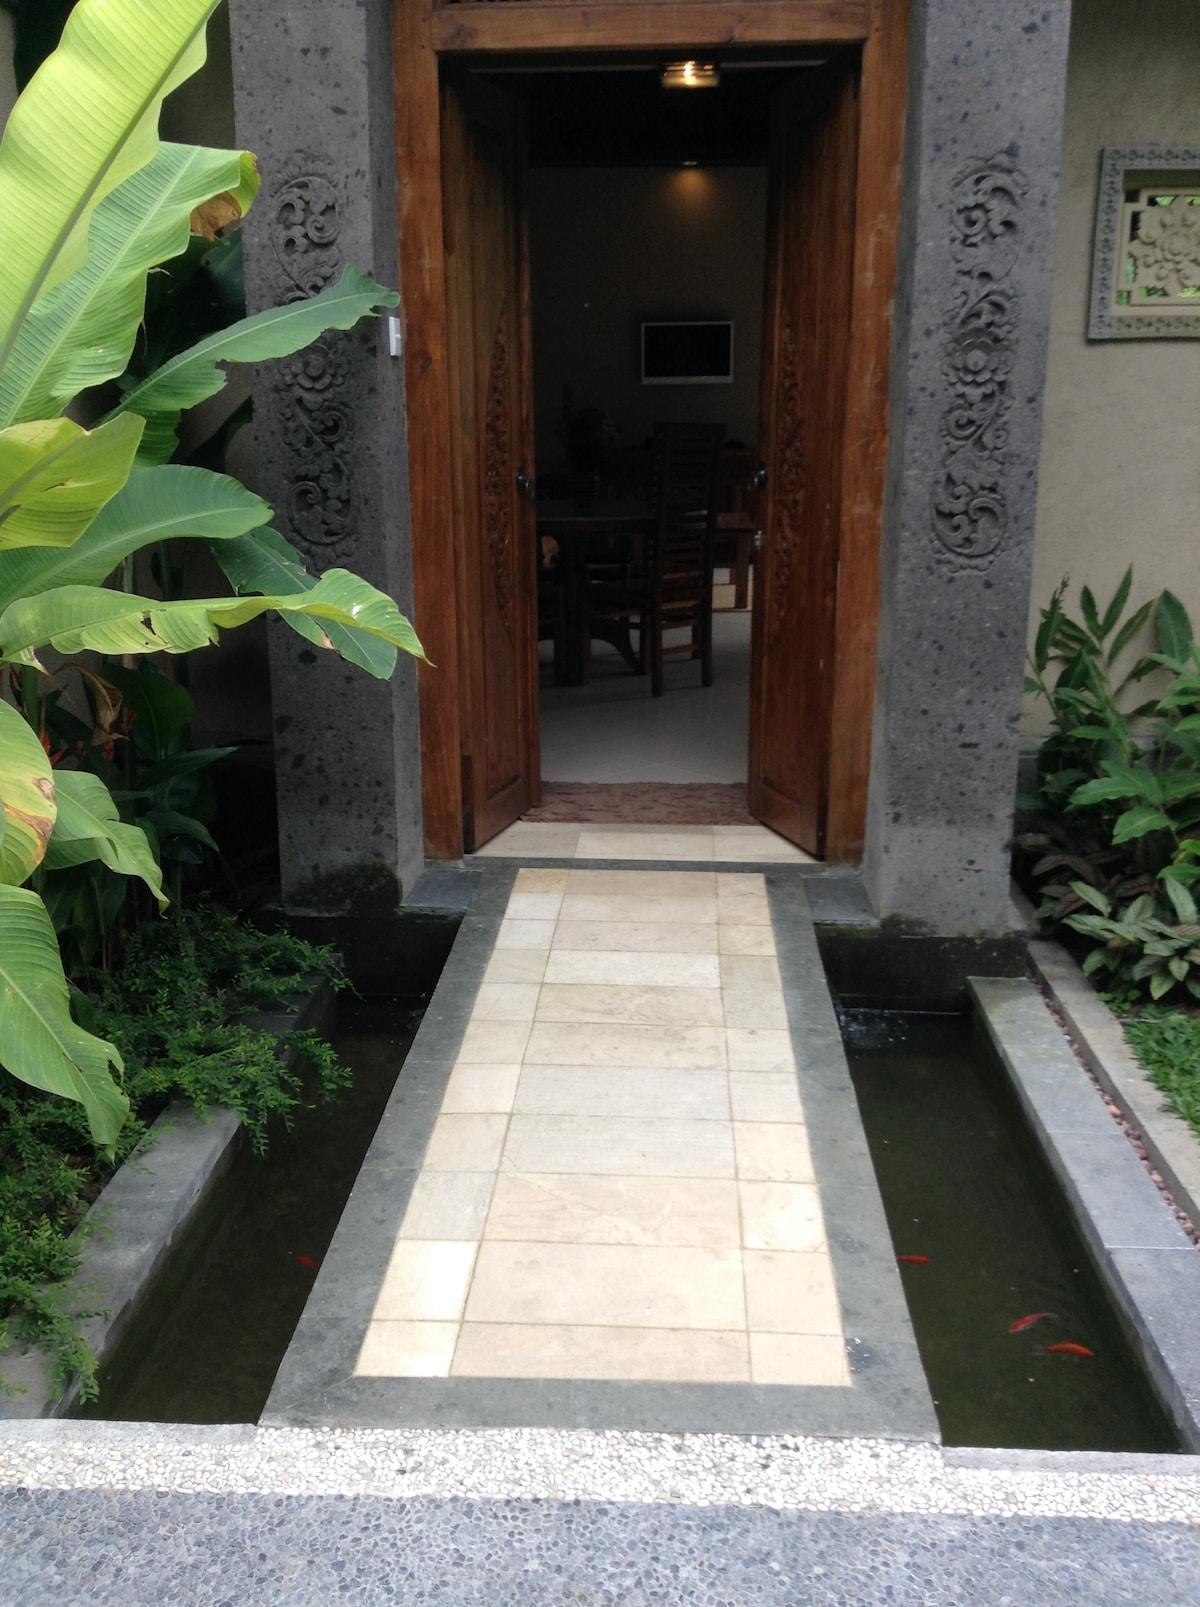 Walk over the coy pond, your fabulous villa awaits!